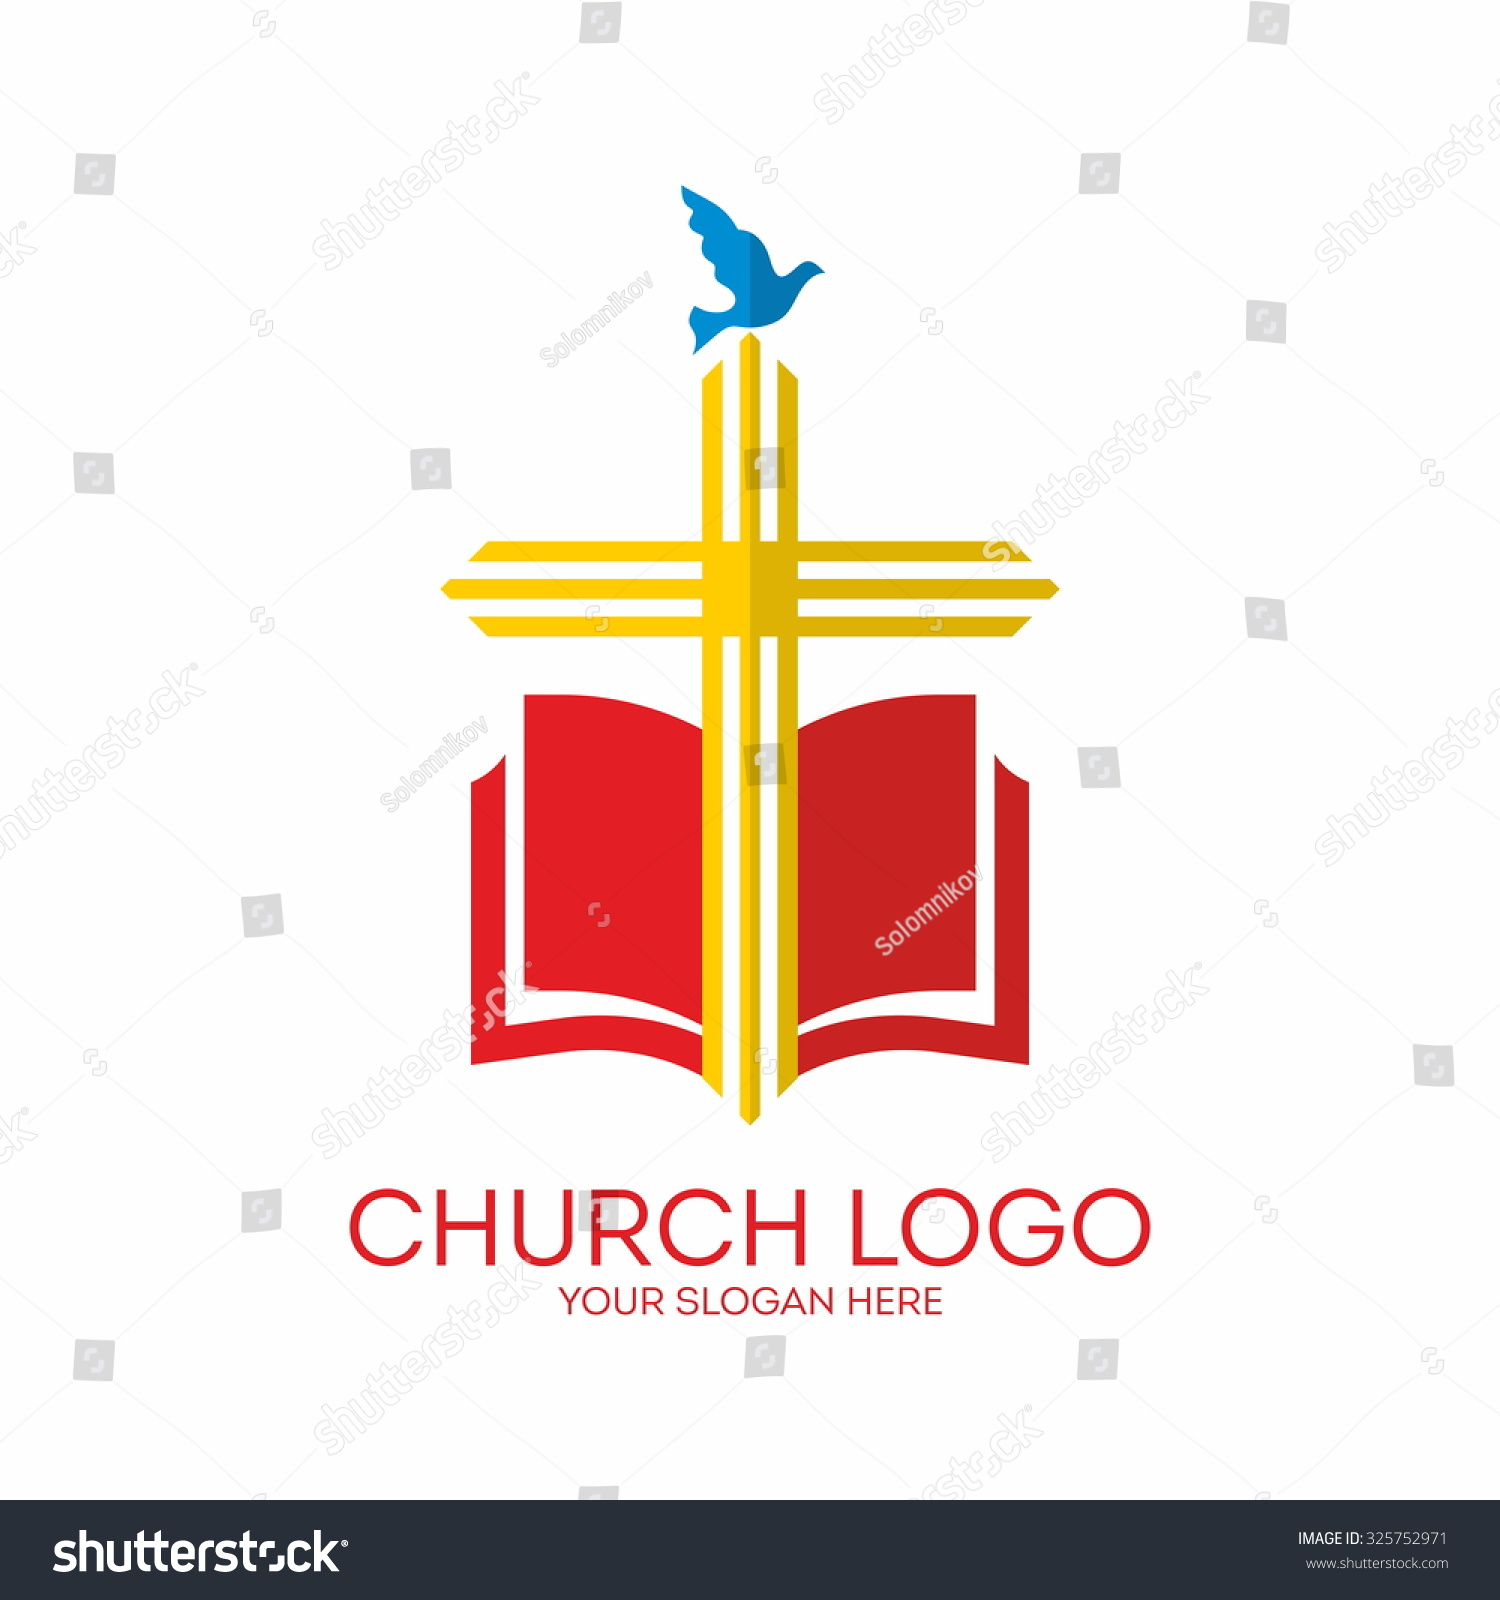 Royalty free church logo cross bible dove 325752971 stock photo church logo cross bible dove 325752971 thecheapjerseys Gallery